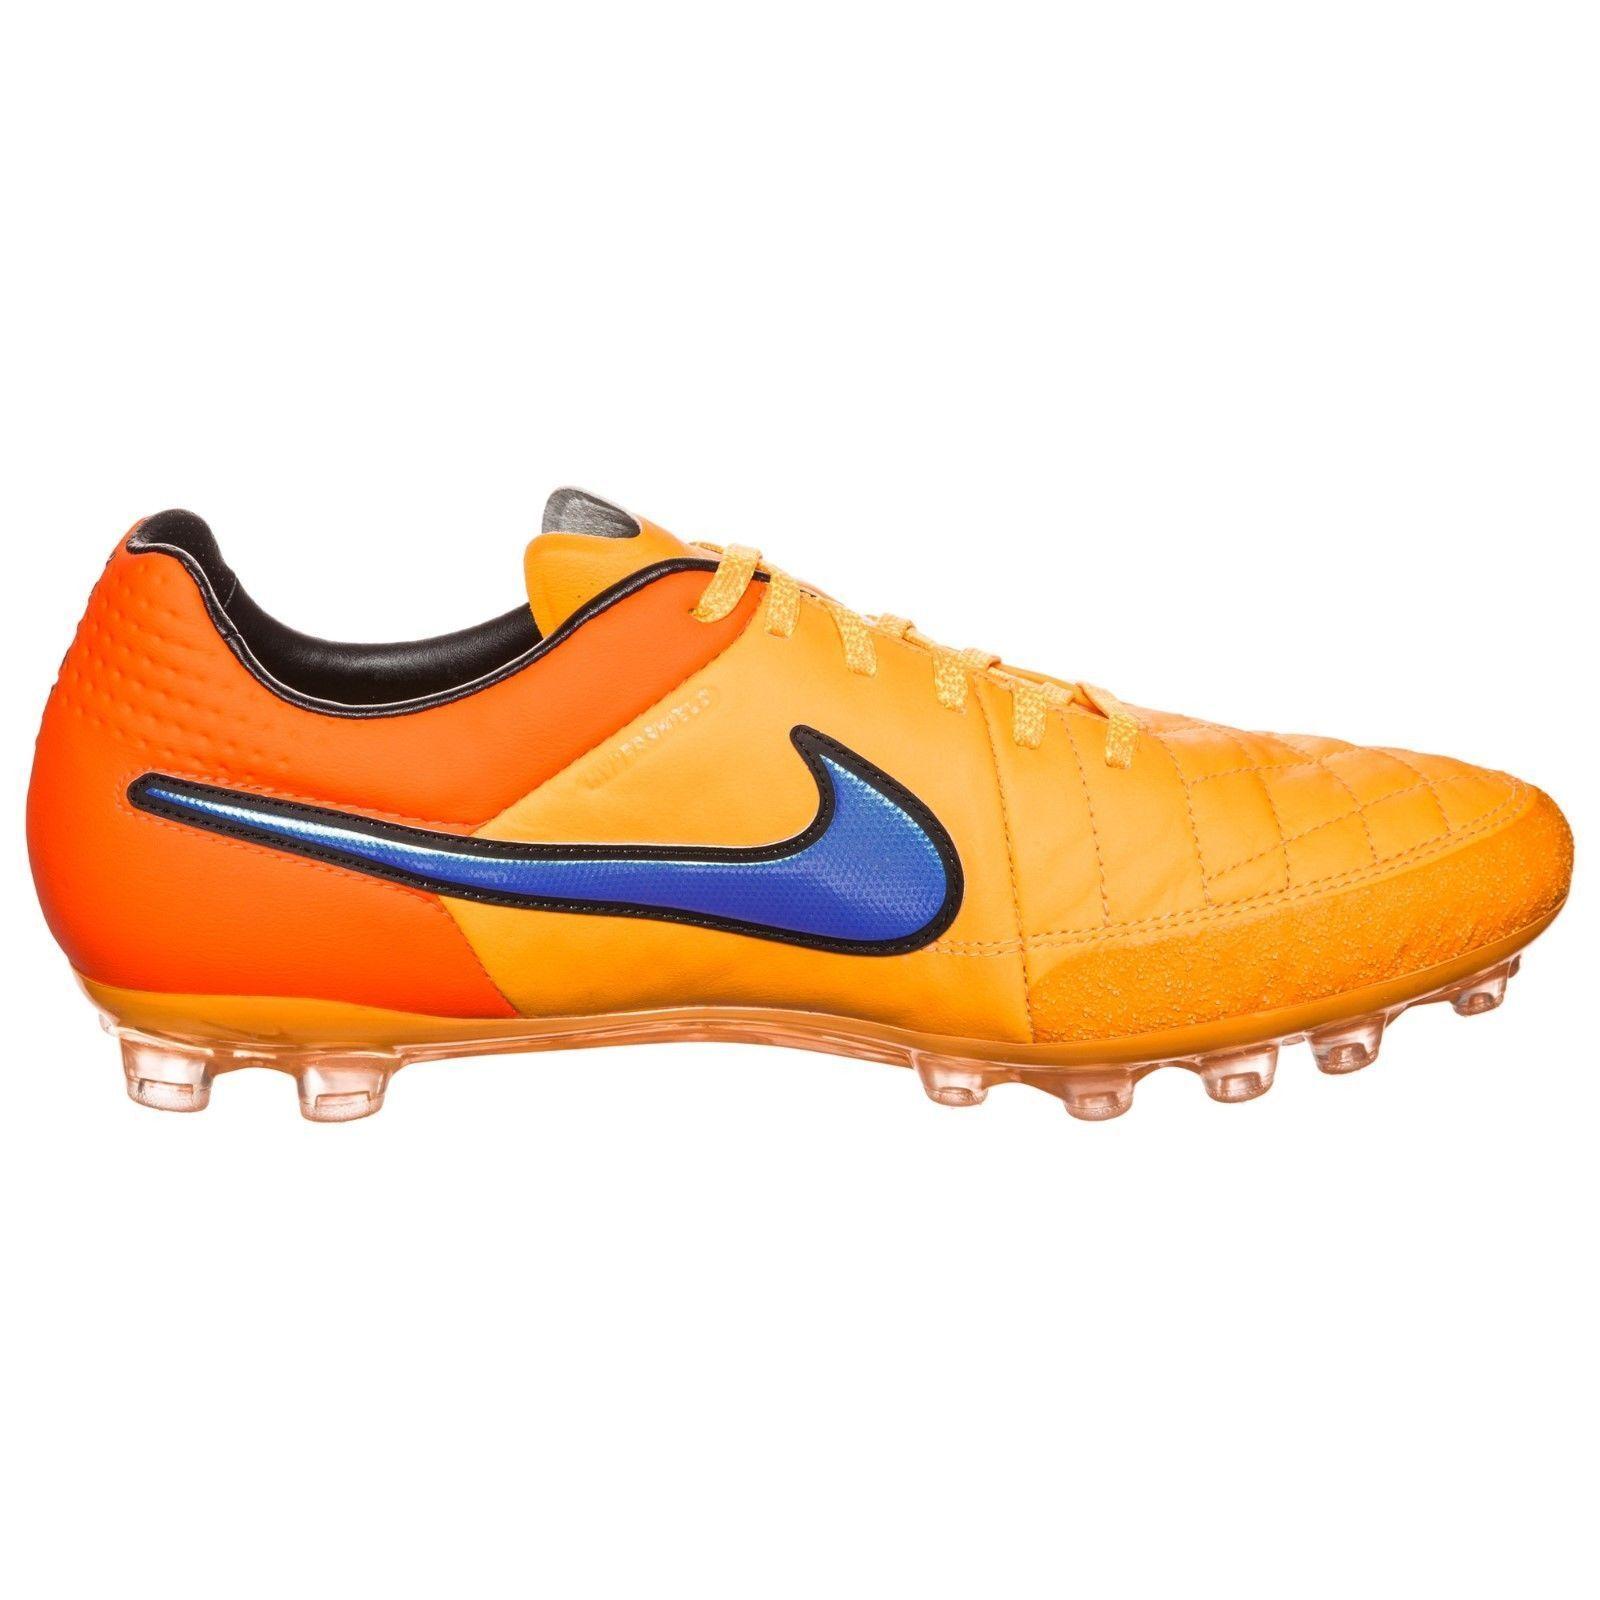 Nike Men's Tieto Legend  V AG -R Sz 6.5 (Wouomo 8) NUOVO 7717143 858 Laser arancia arancia  prezzi all'ingrosso